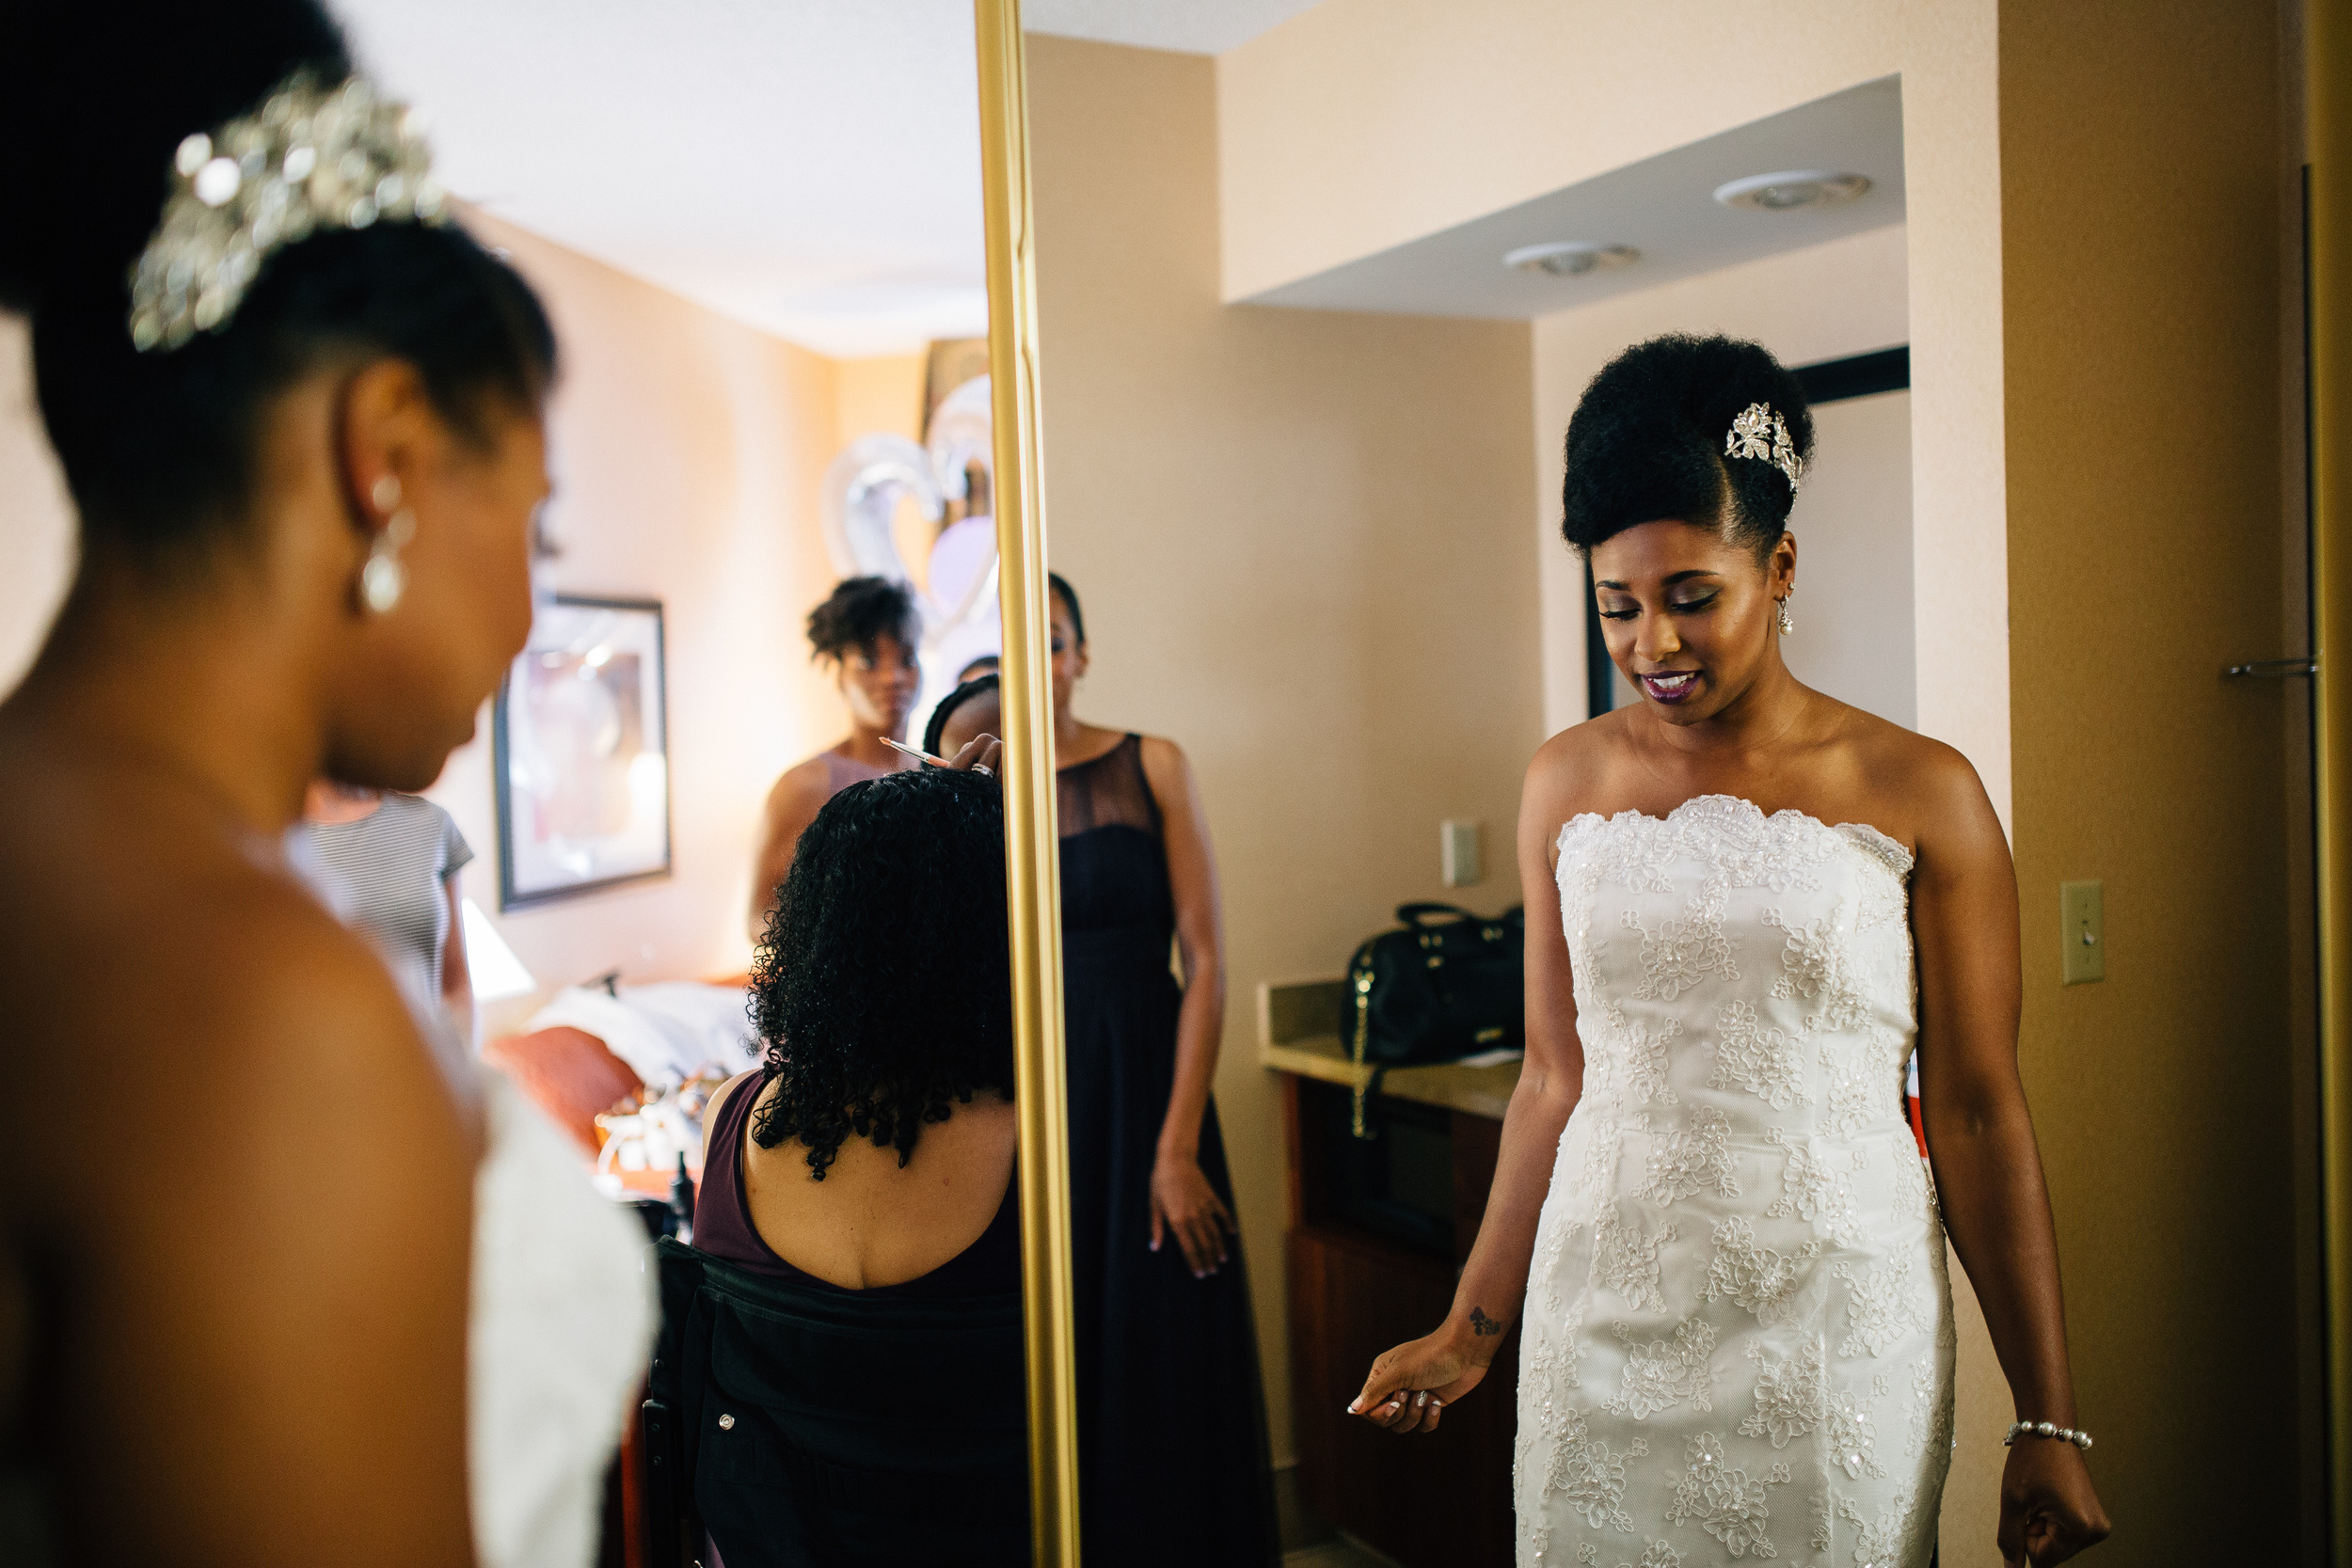 Chuck & Alicia's Wedding - Corrie Mick Photography-153.jpg